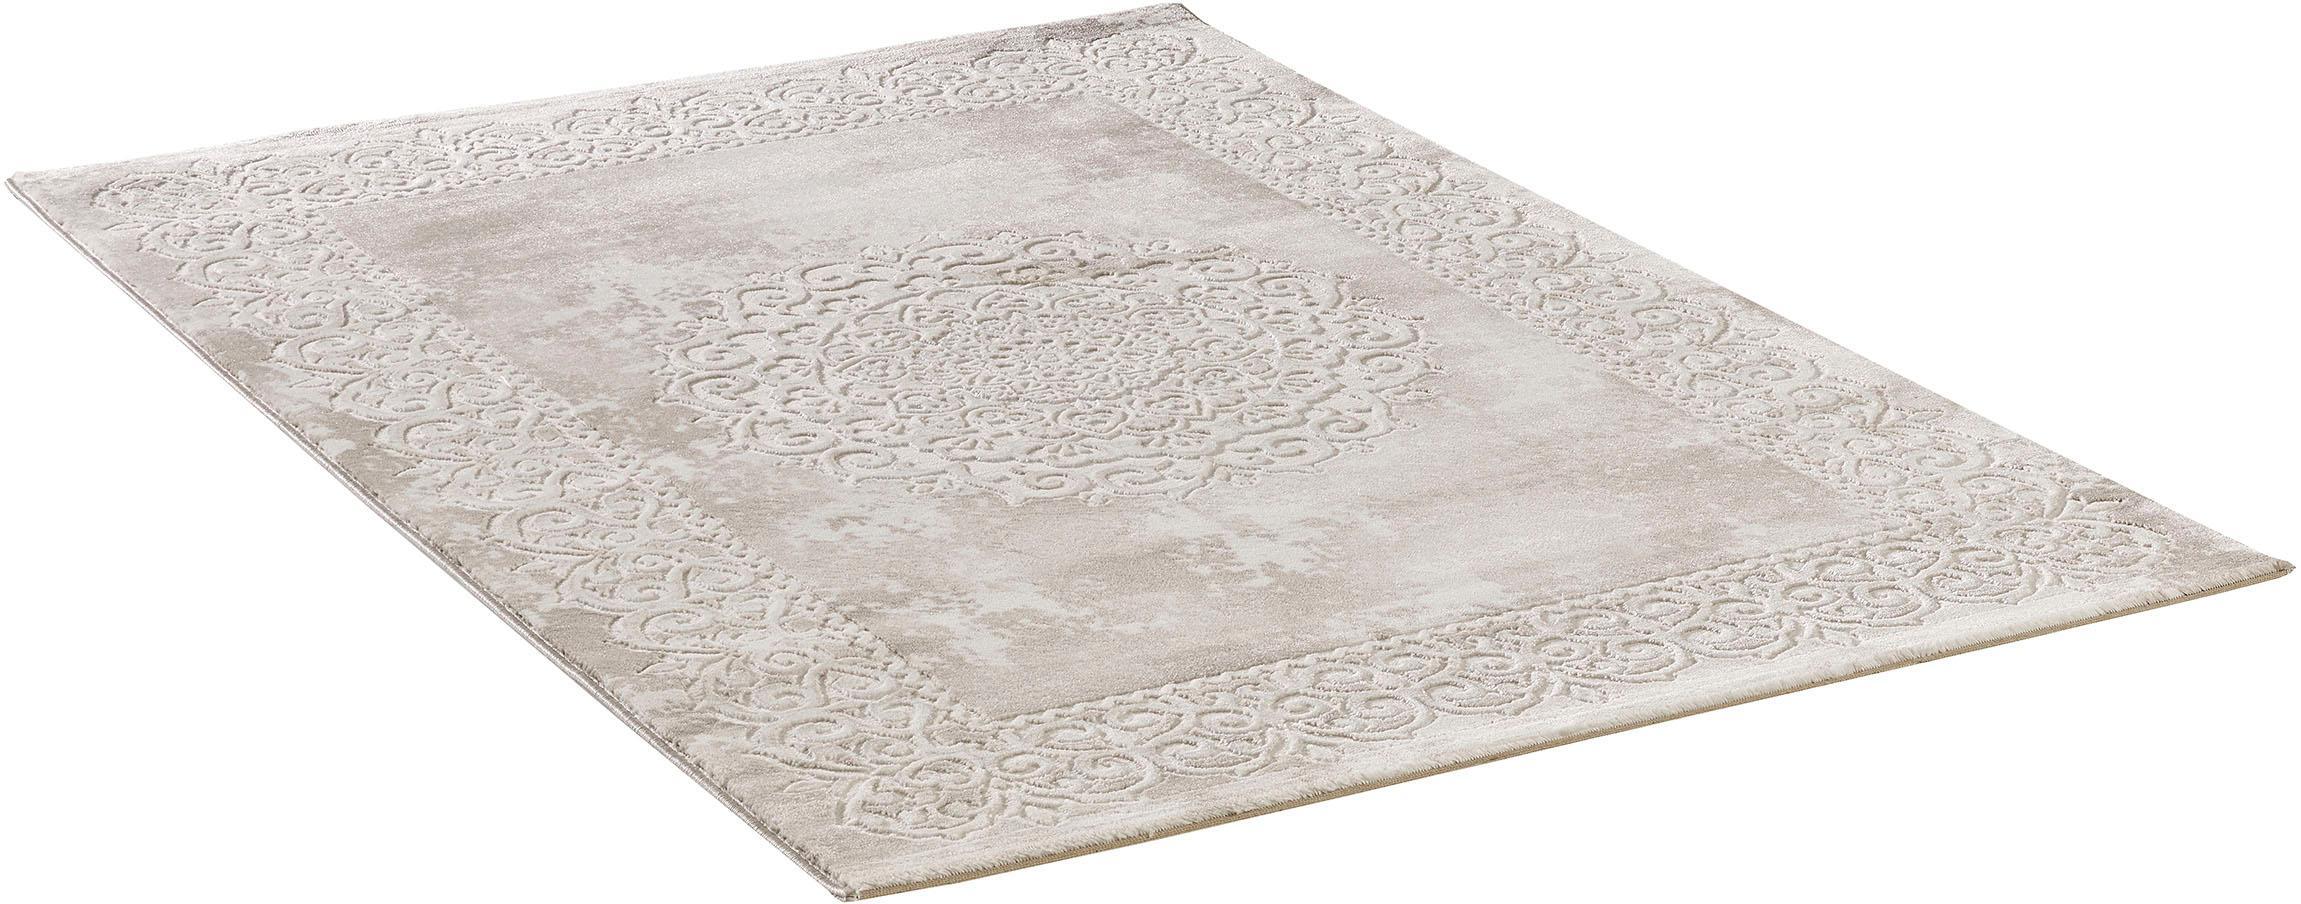 Teppich Harmony 3205 Sanat Teppiche rechteckig Höhe 12 mm maschinell gewebt